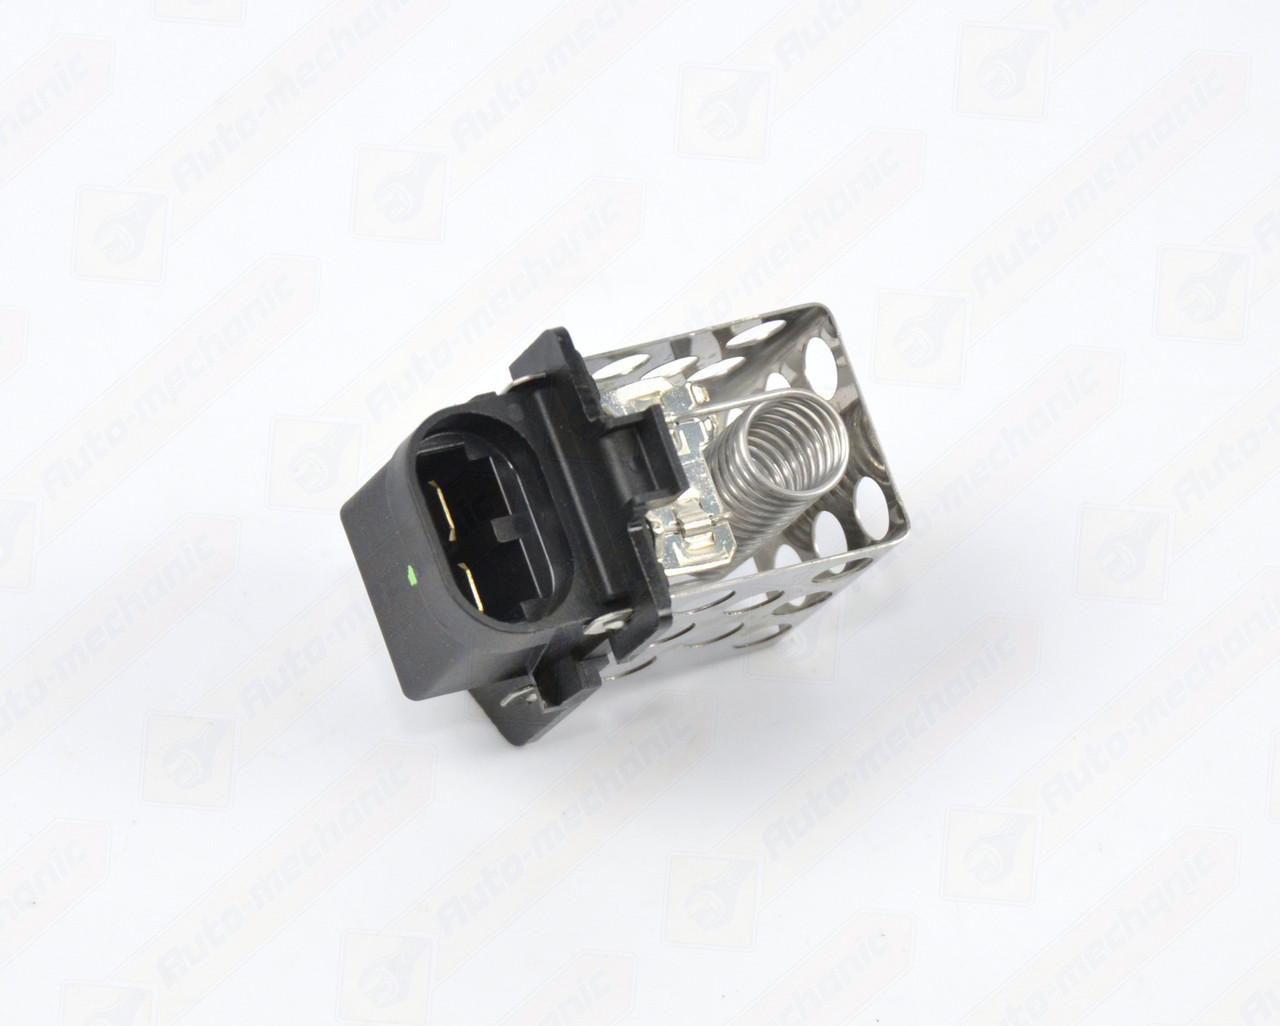 Резистор вентилятора охлаждения двигателя на Renault Kangoo 1997->2008 - SEIM (Франция) - 119280